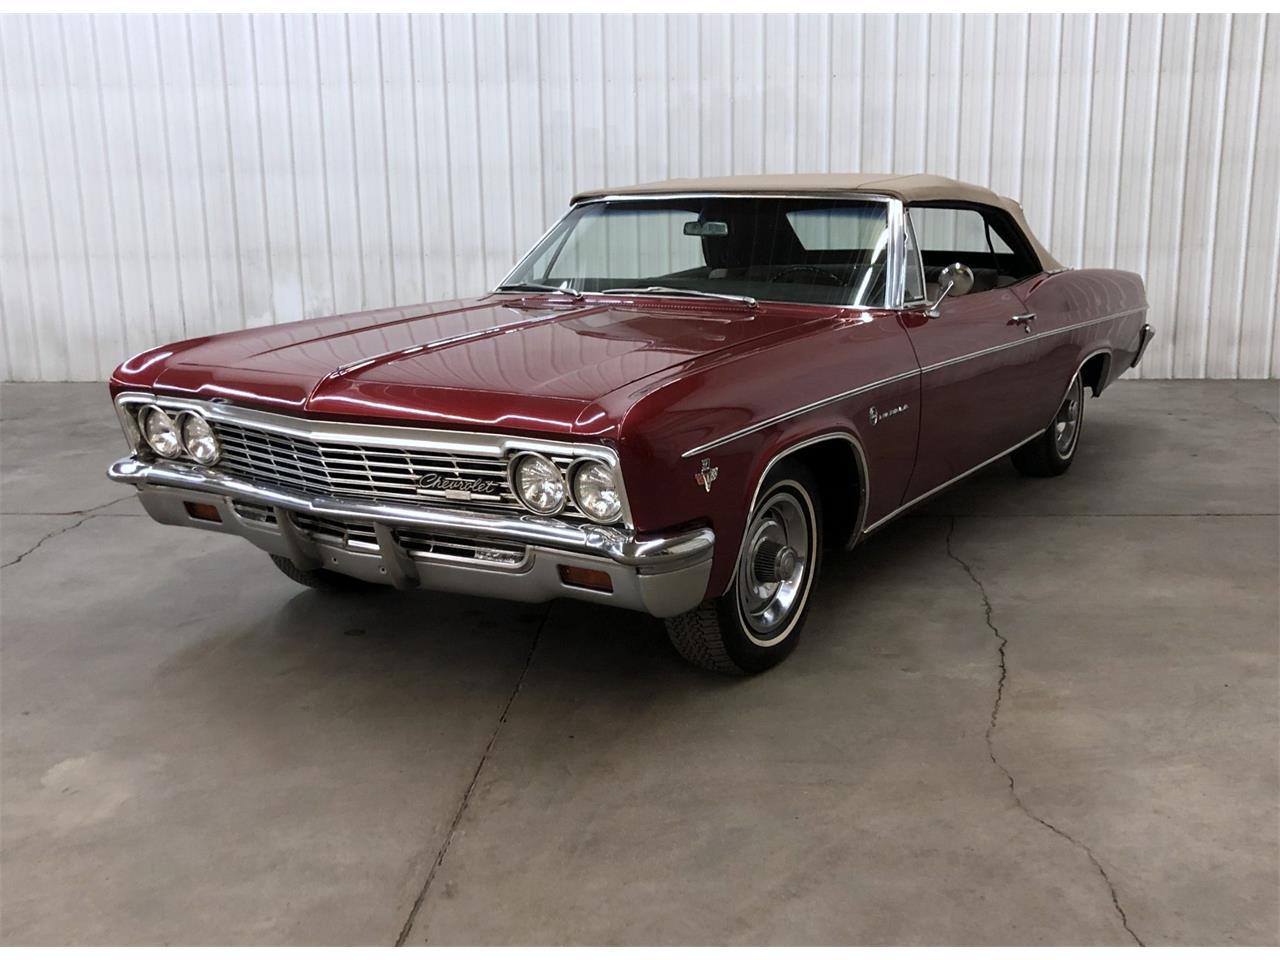 1966 Chevrolet Impala (CC-1320191) for sale in Maple Lake, Minnesota